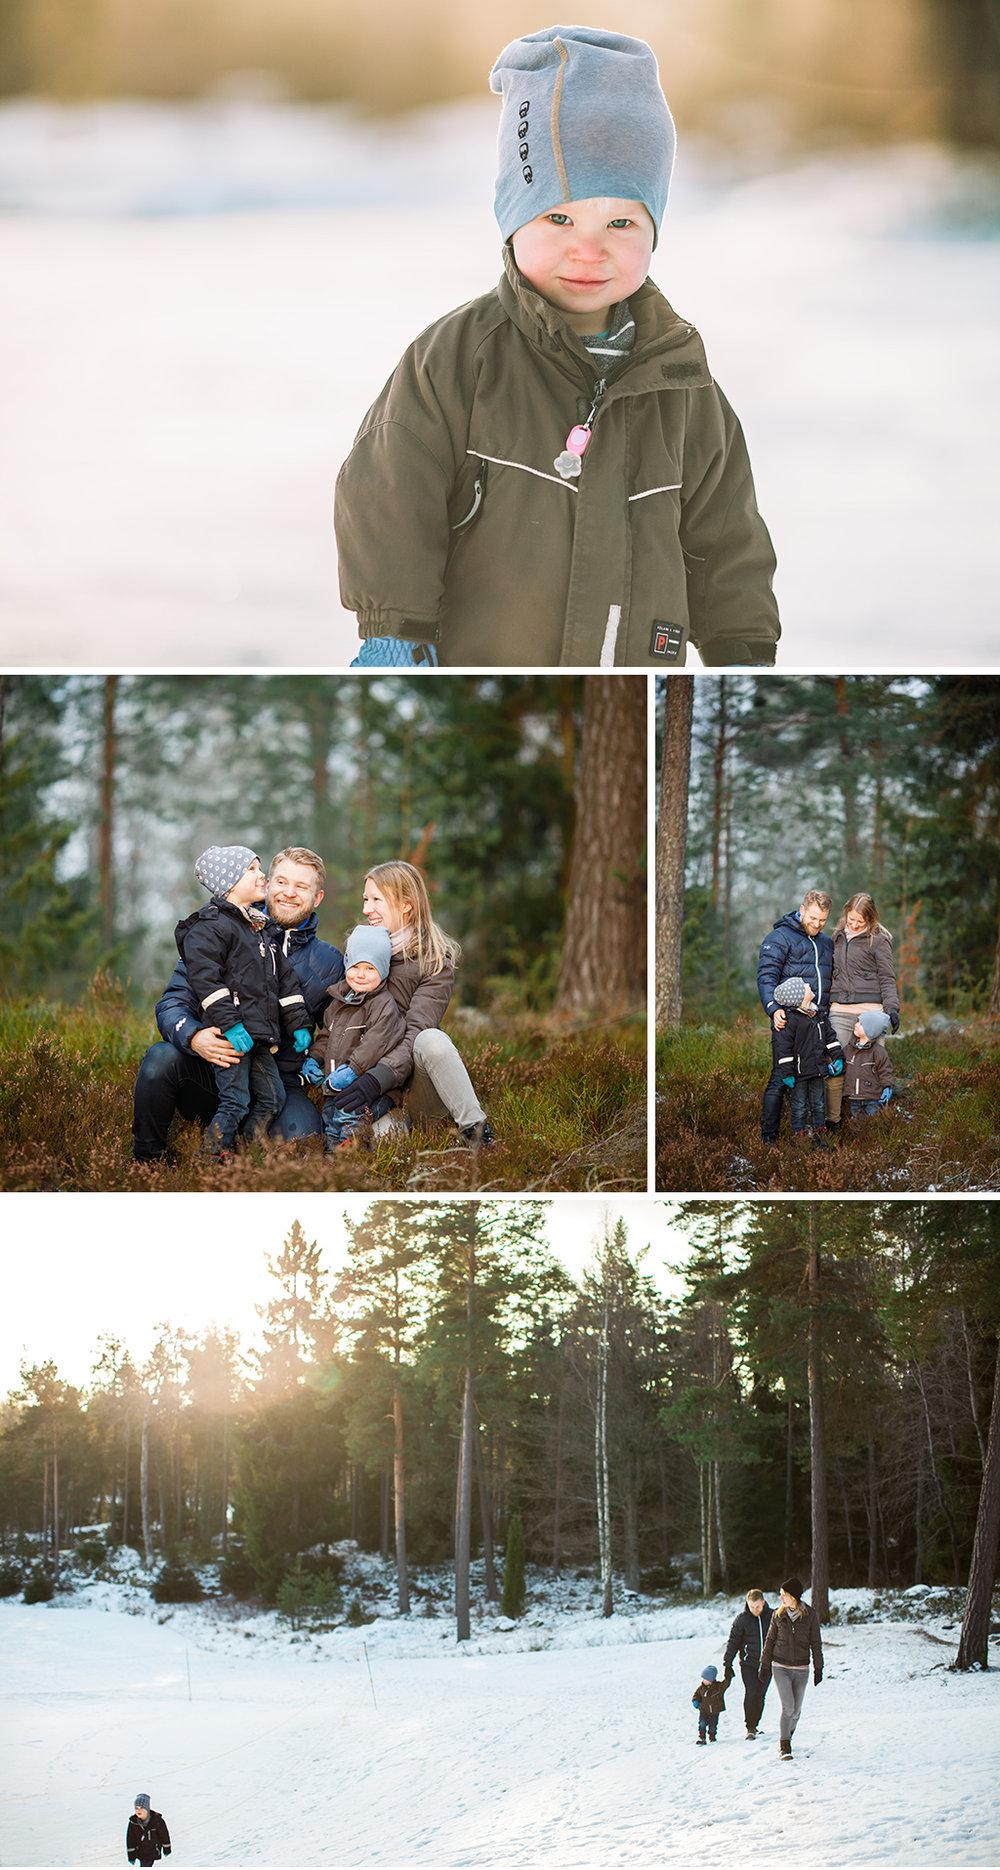 Vinterfotografering_Lifestyle_familjefotograf_stockholm-2.jpg